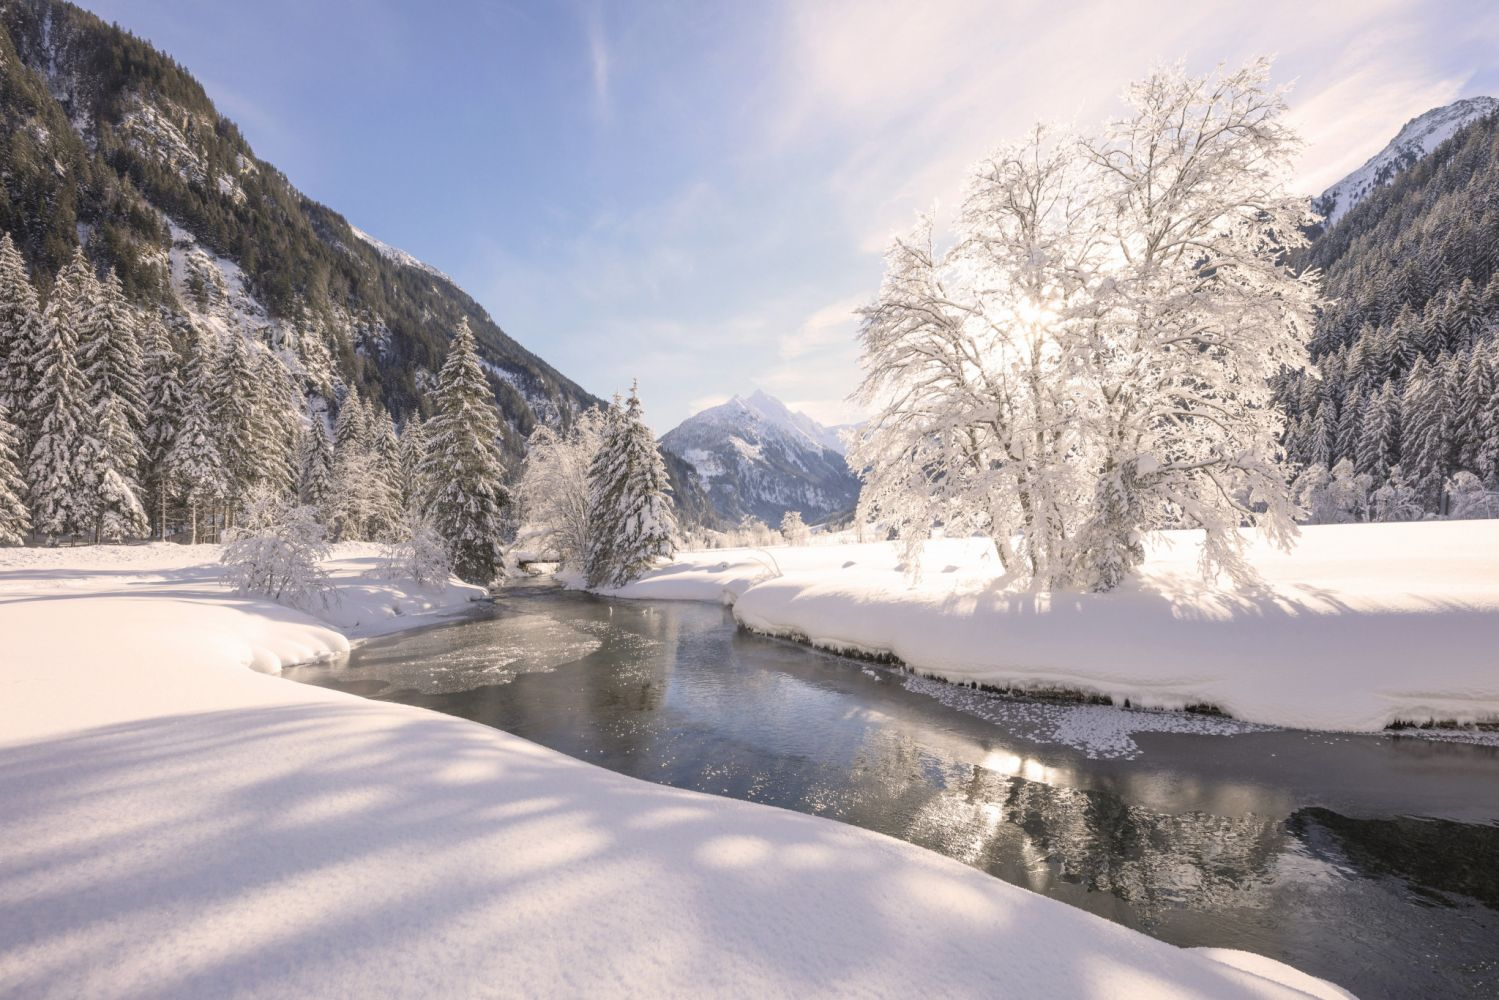 Winterszenerie entlang des Winterwanderwegs im Untertal